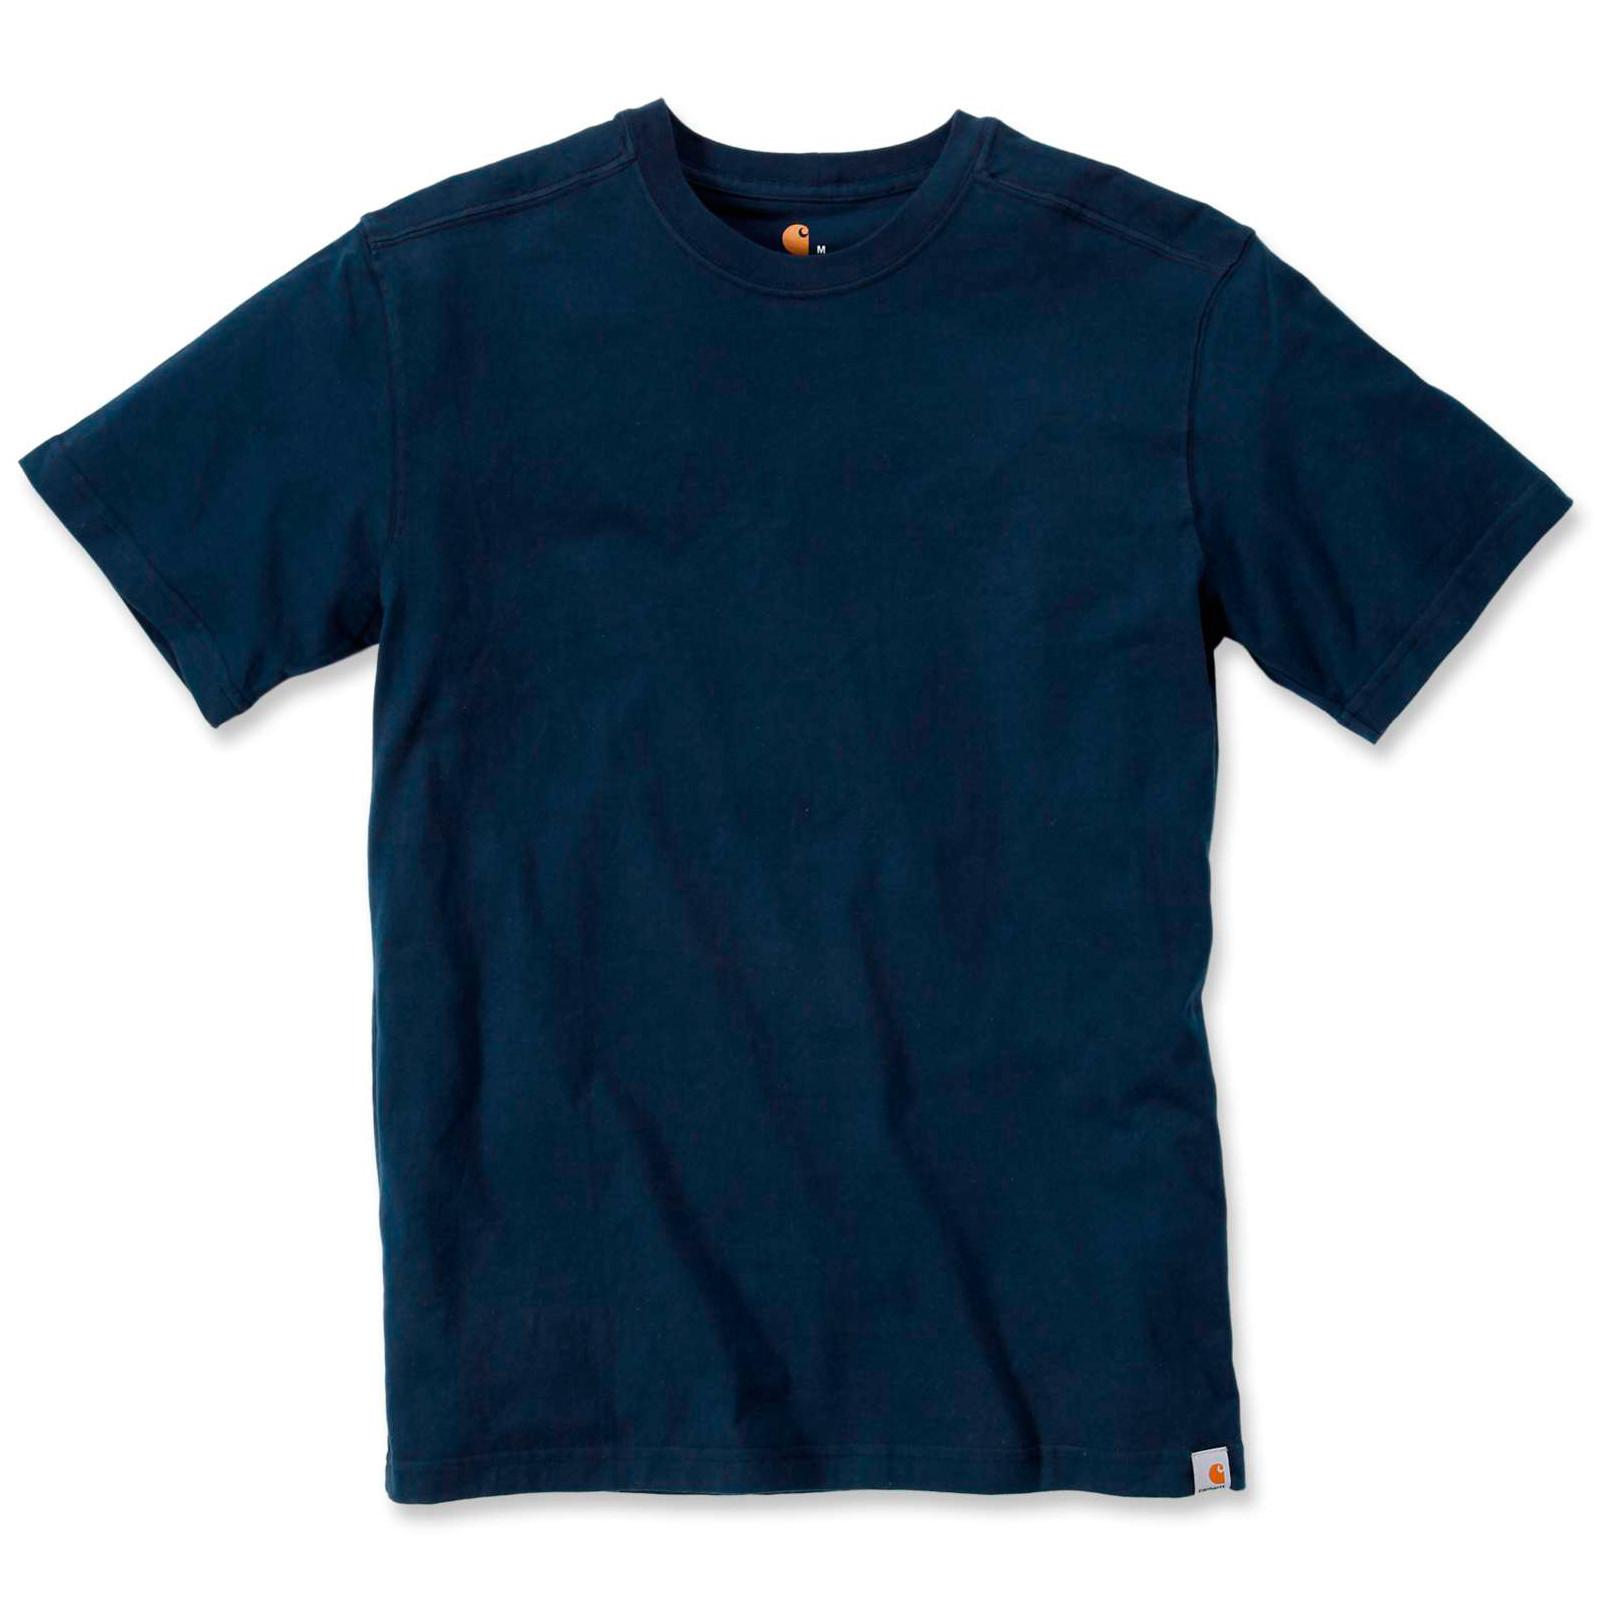 Футболка Carhartt Maddock T-Shirt S/S - 101124 (Navy, L)